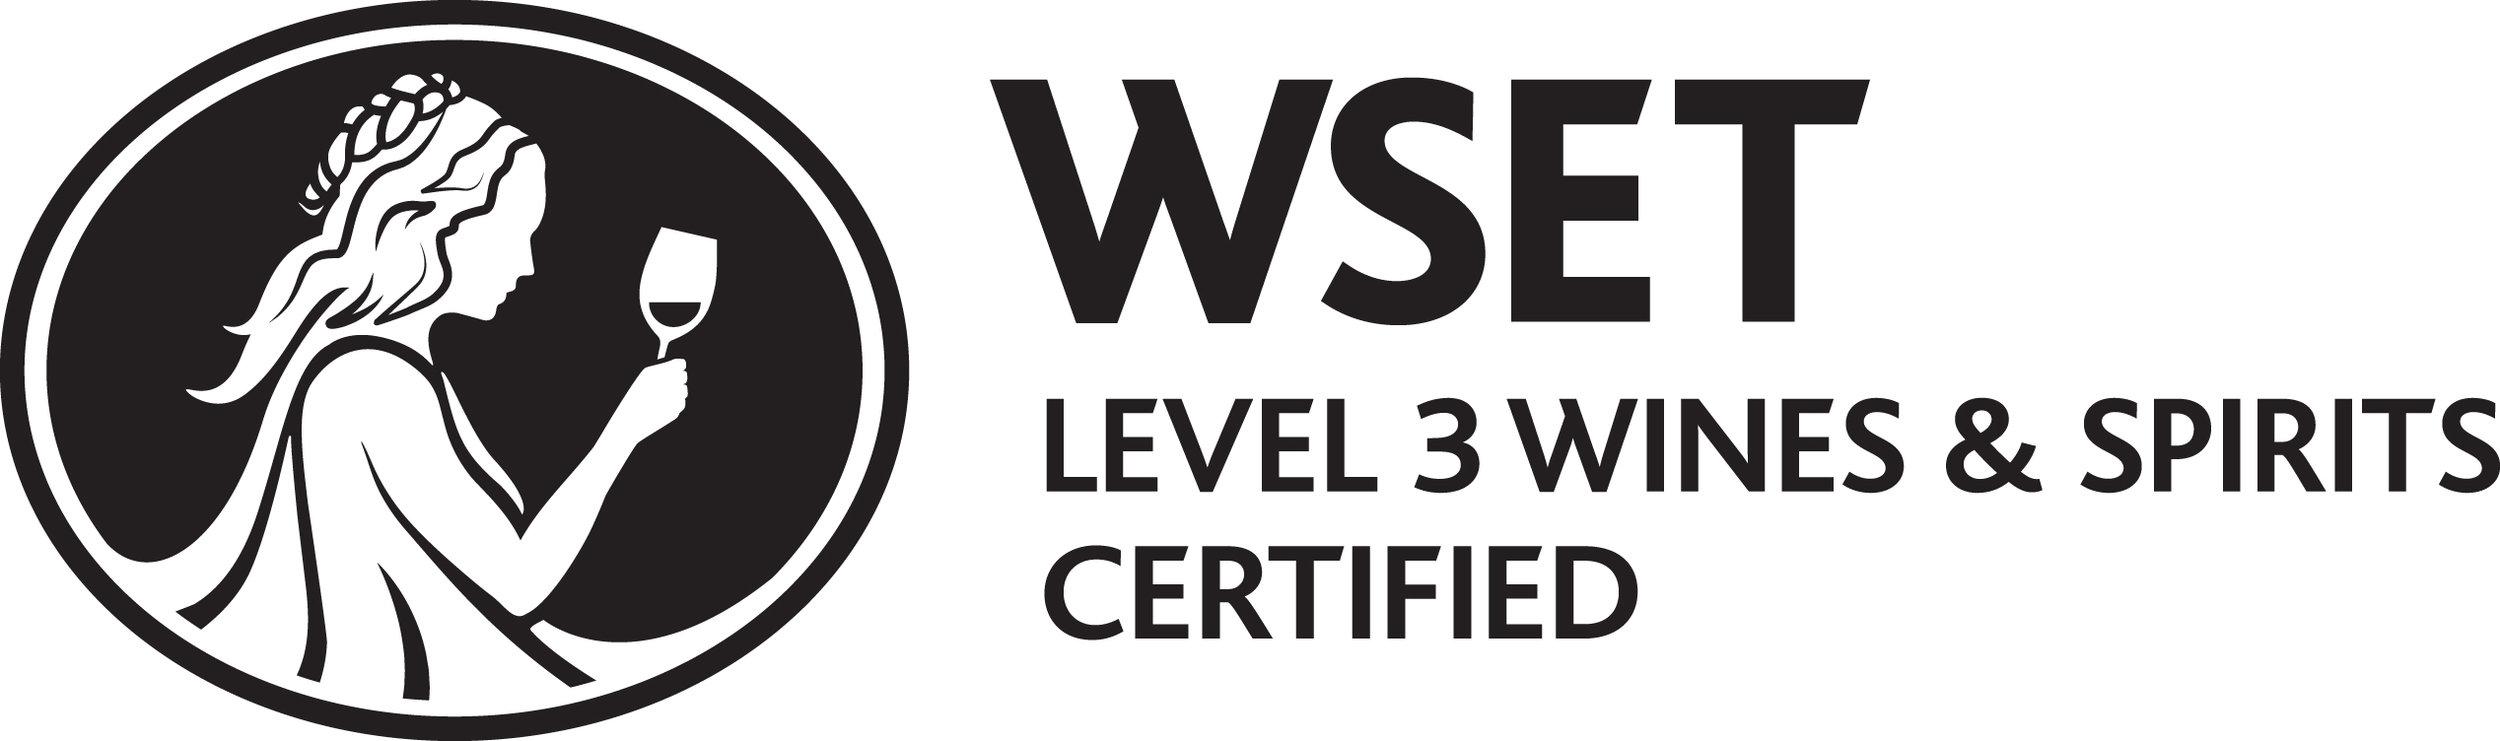 WSET_Level_3_blk.jpg